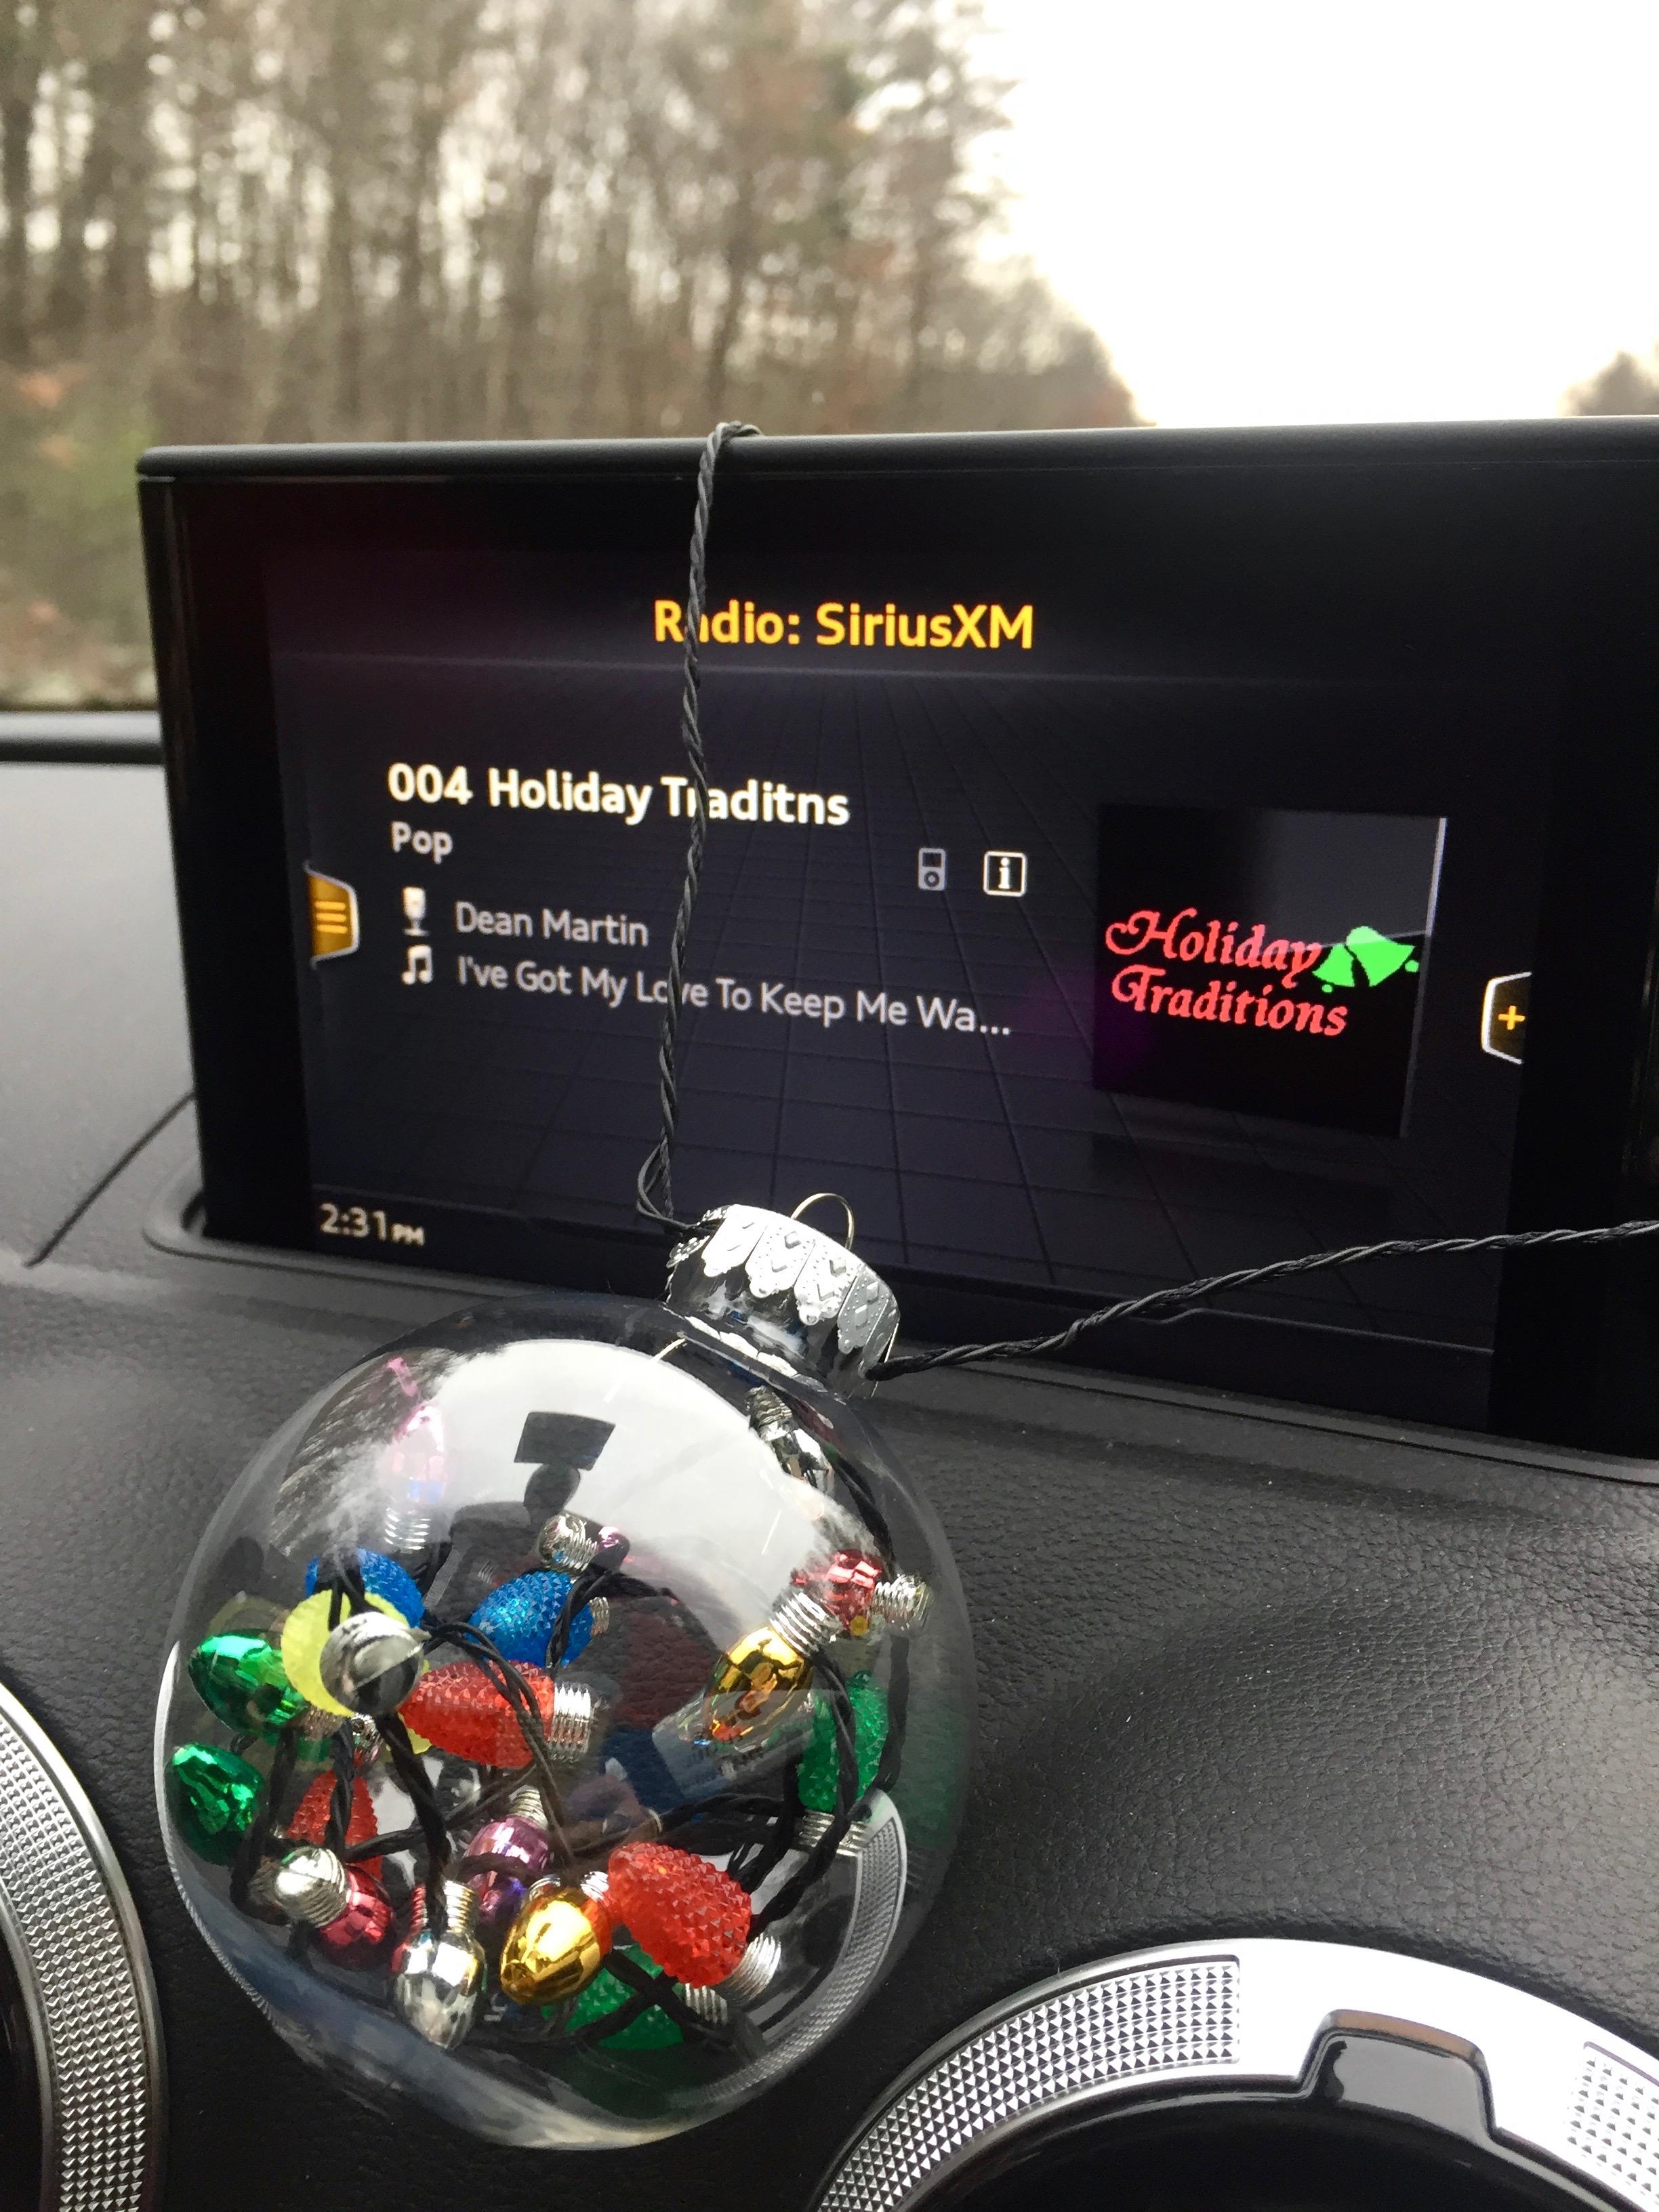 Christmas ornament on the dashboard